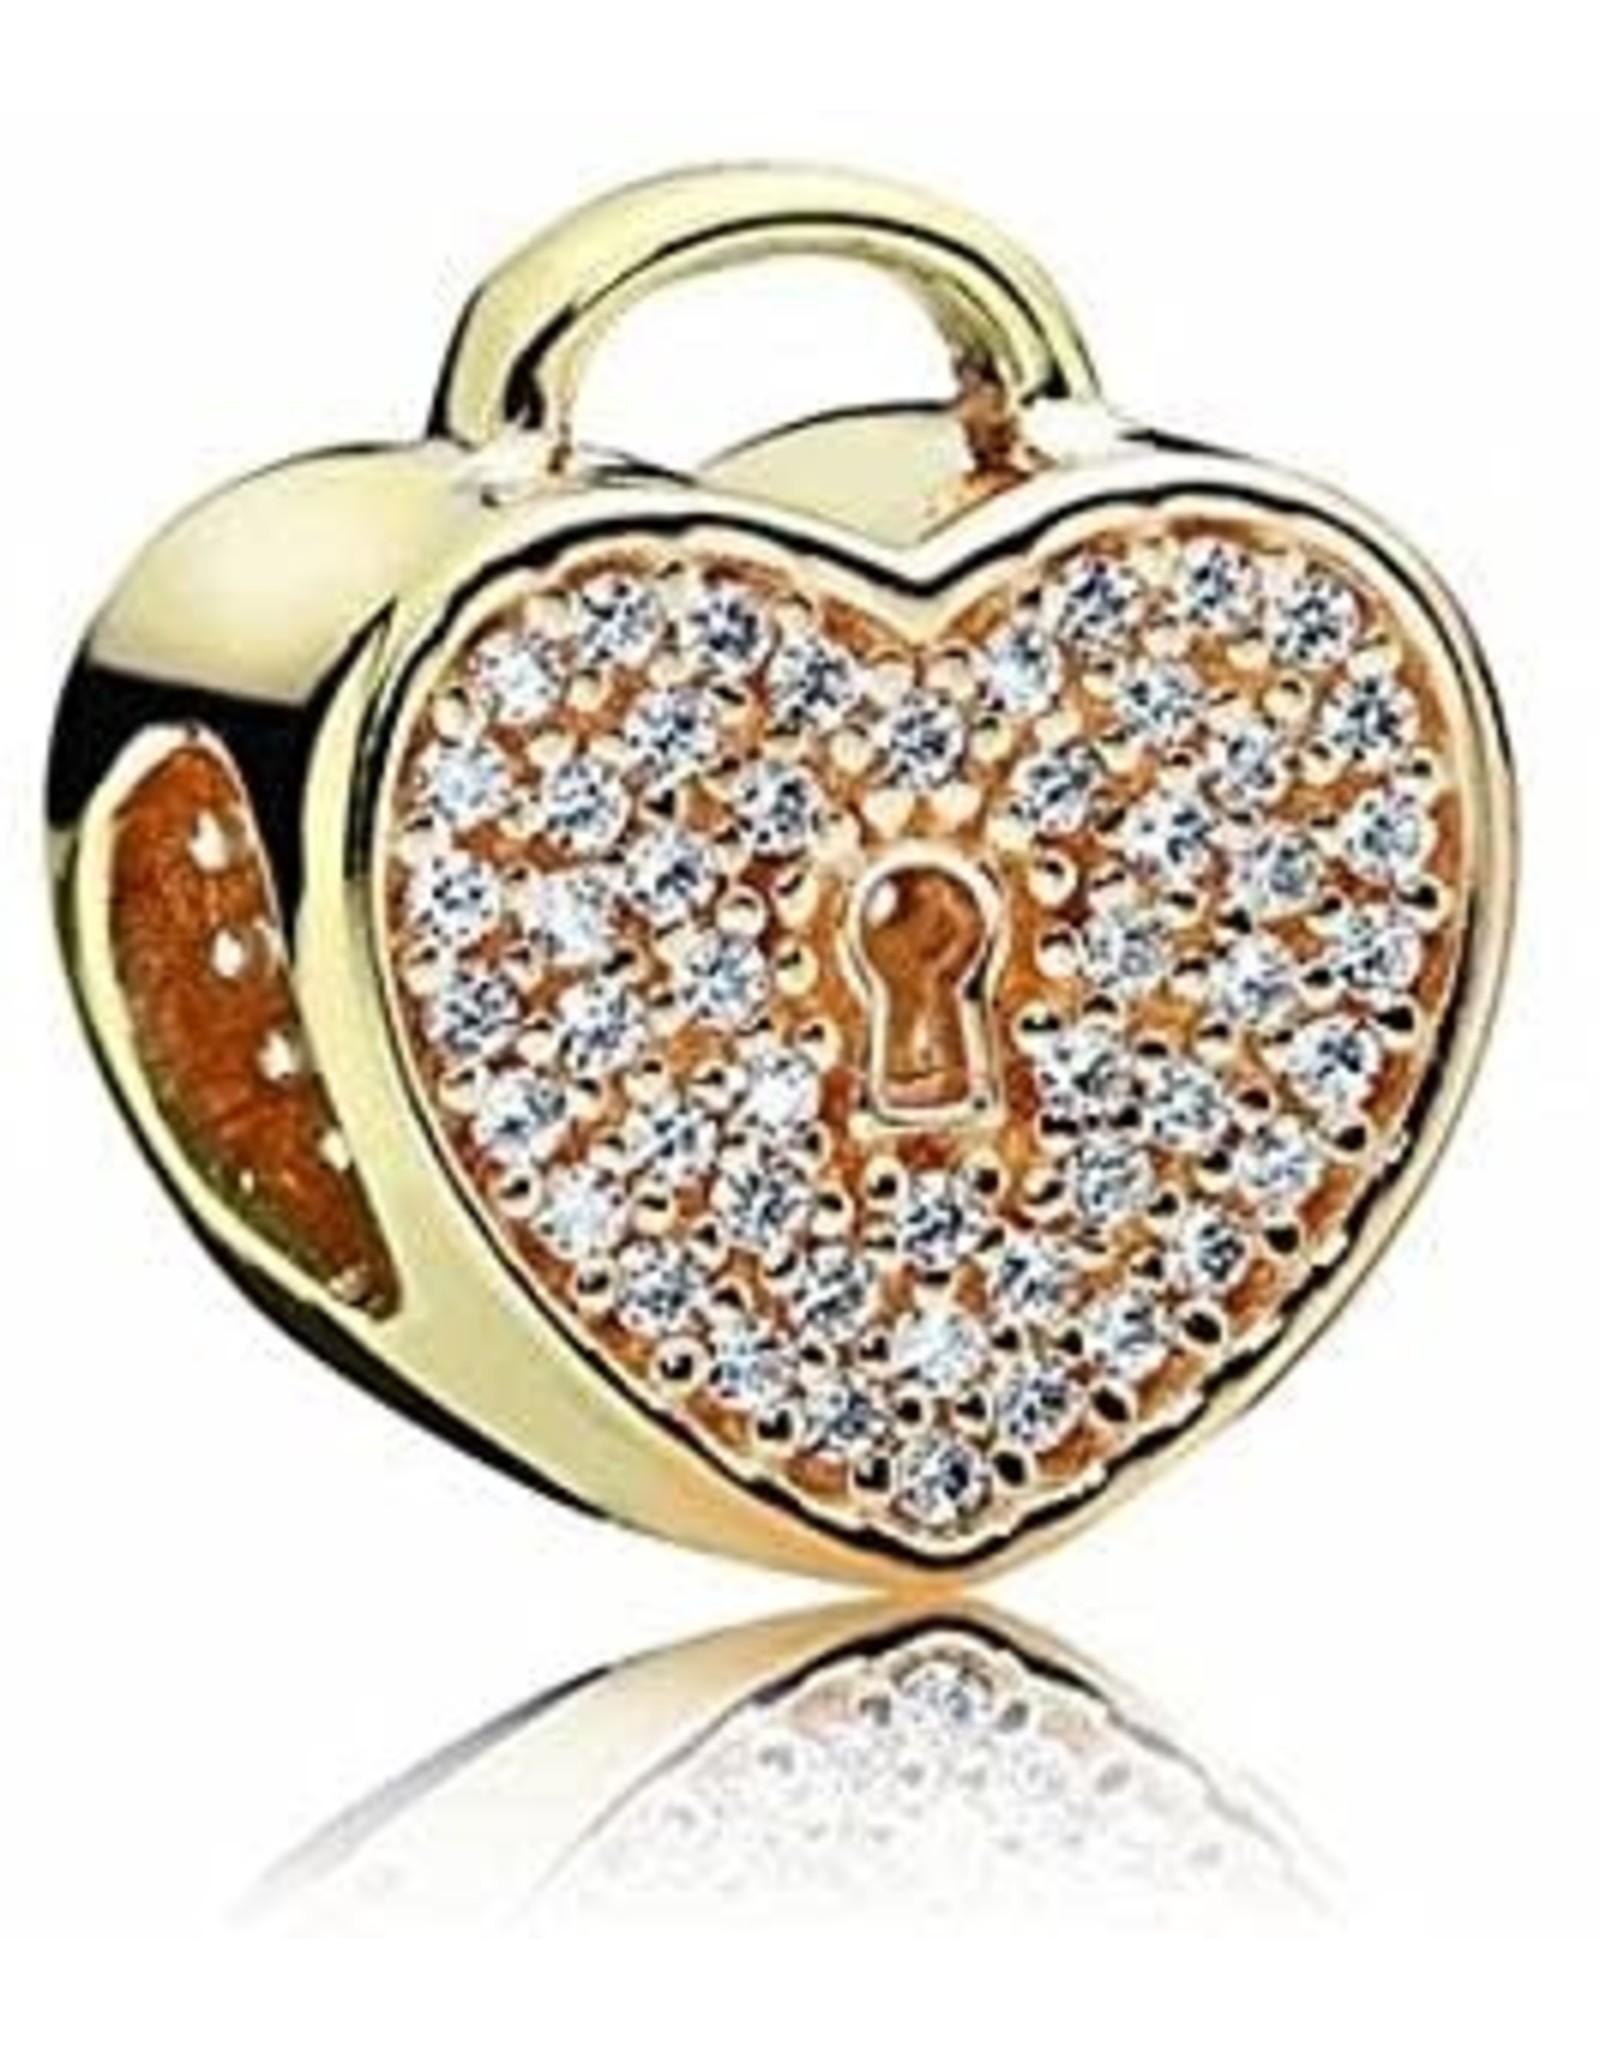 Pandora Pandora Charm, 14K Gold, Heart Lock, Clear CZ